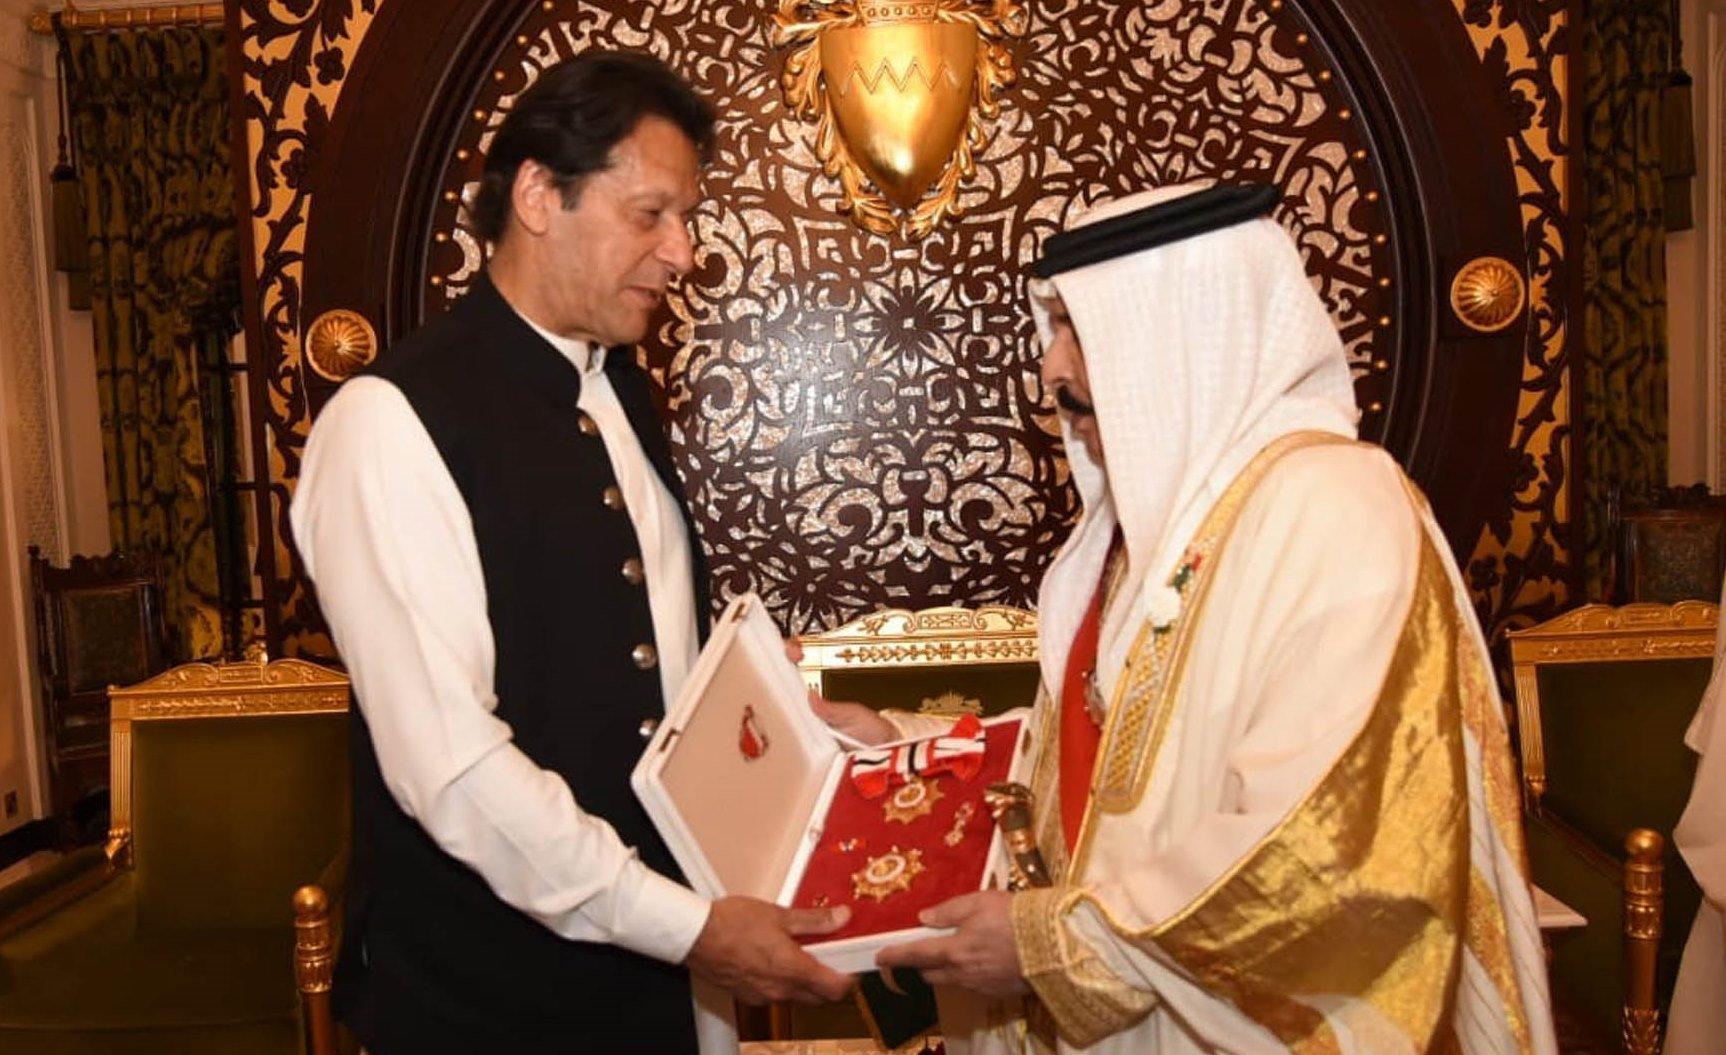 King Hamad Bin Isa Al Khalifa confers 'Bahrain Order on Prime Minister Imran Khan at Sakhir Palace in Manama